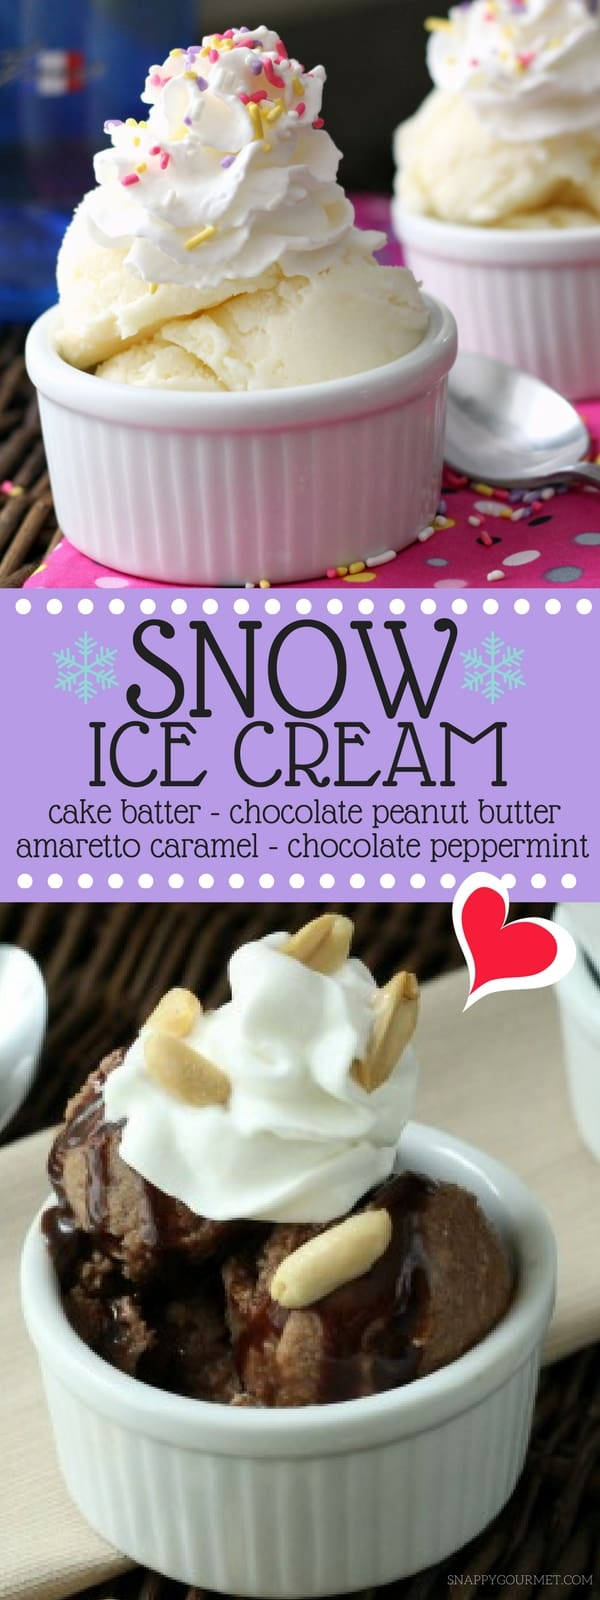 Easy Snow Ice Cream recipe - DIY homemade snow ice cream for those wondering how to make snow ice cream. 4 flavors: vanilla cake batter, chocolate peanut butter, amaretto caramel, and chocolate peppermint